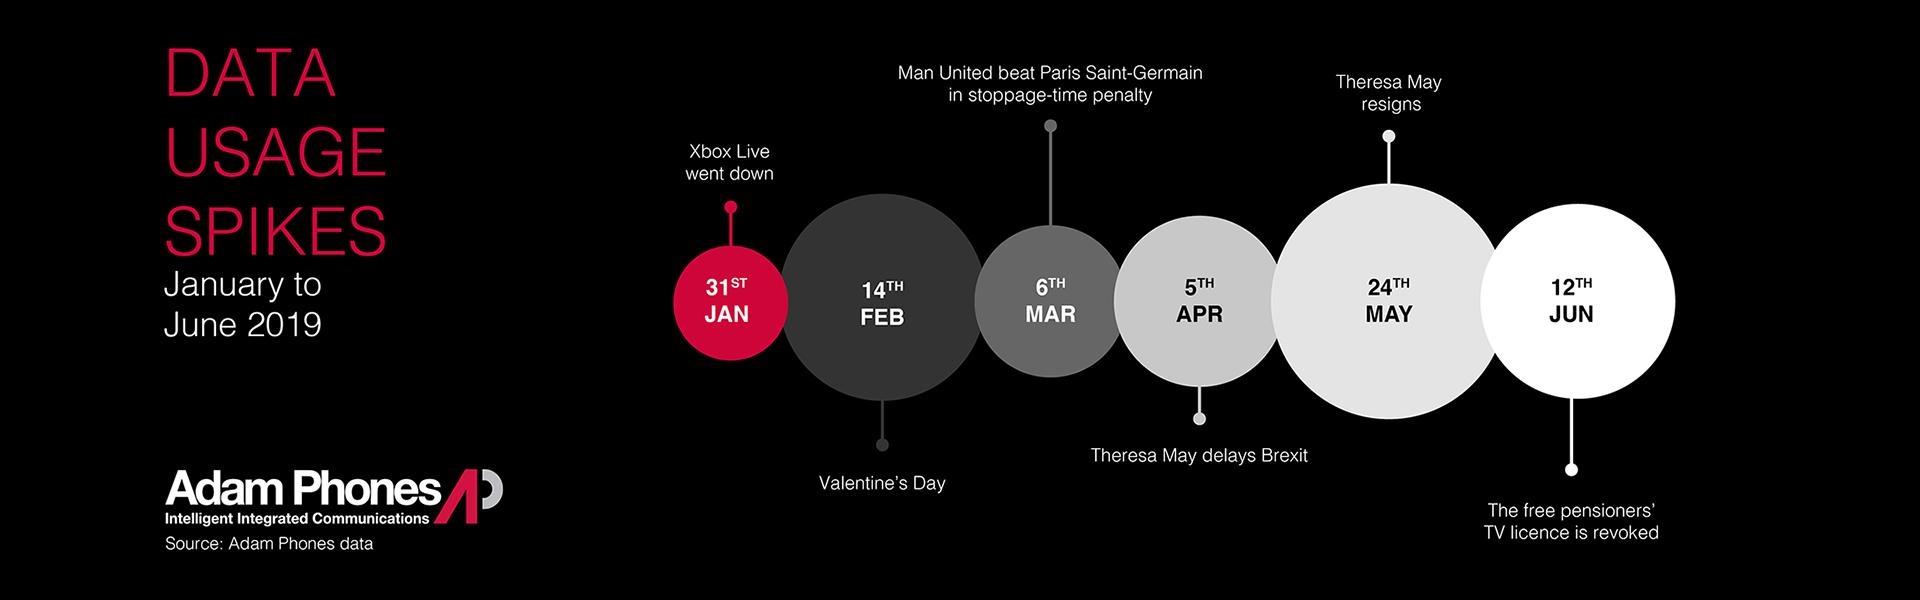 Data Usage Spike January to June 2019